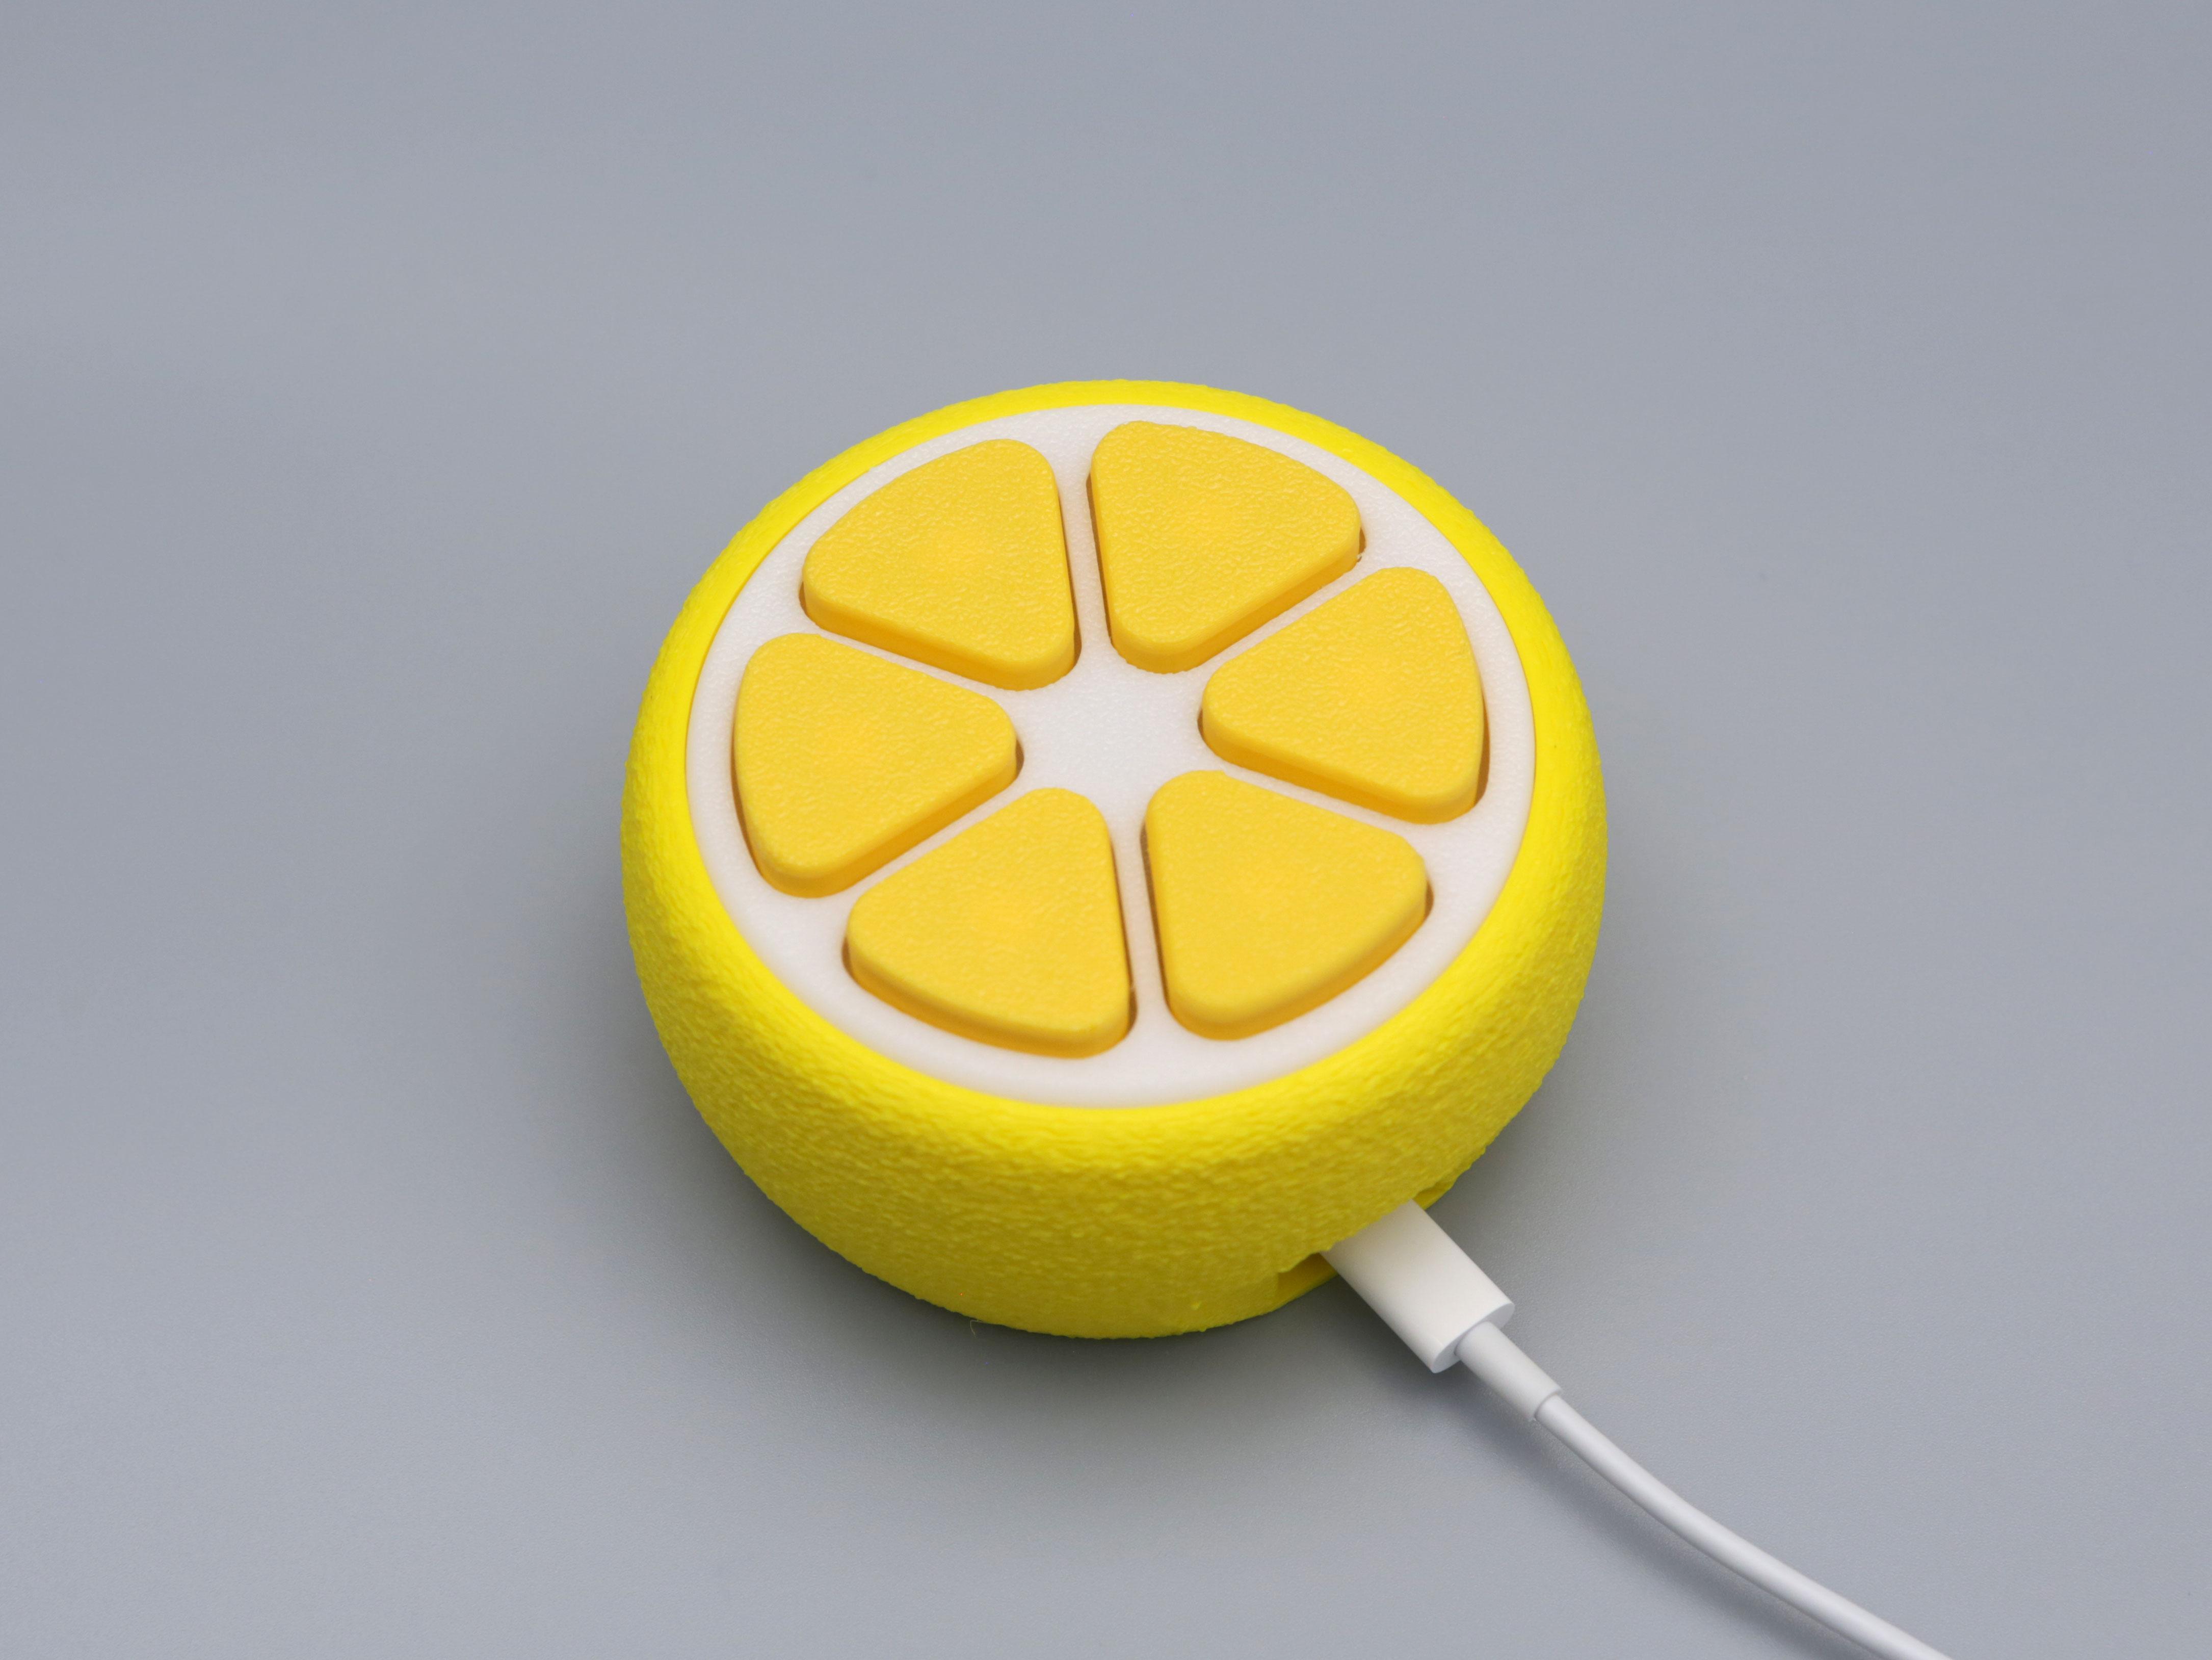 3d_printing_hero-lemon-usb.jpg